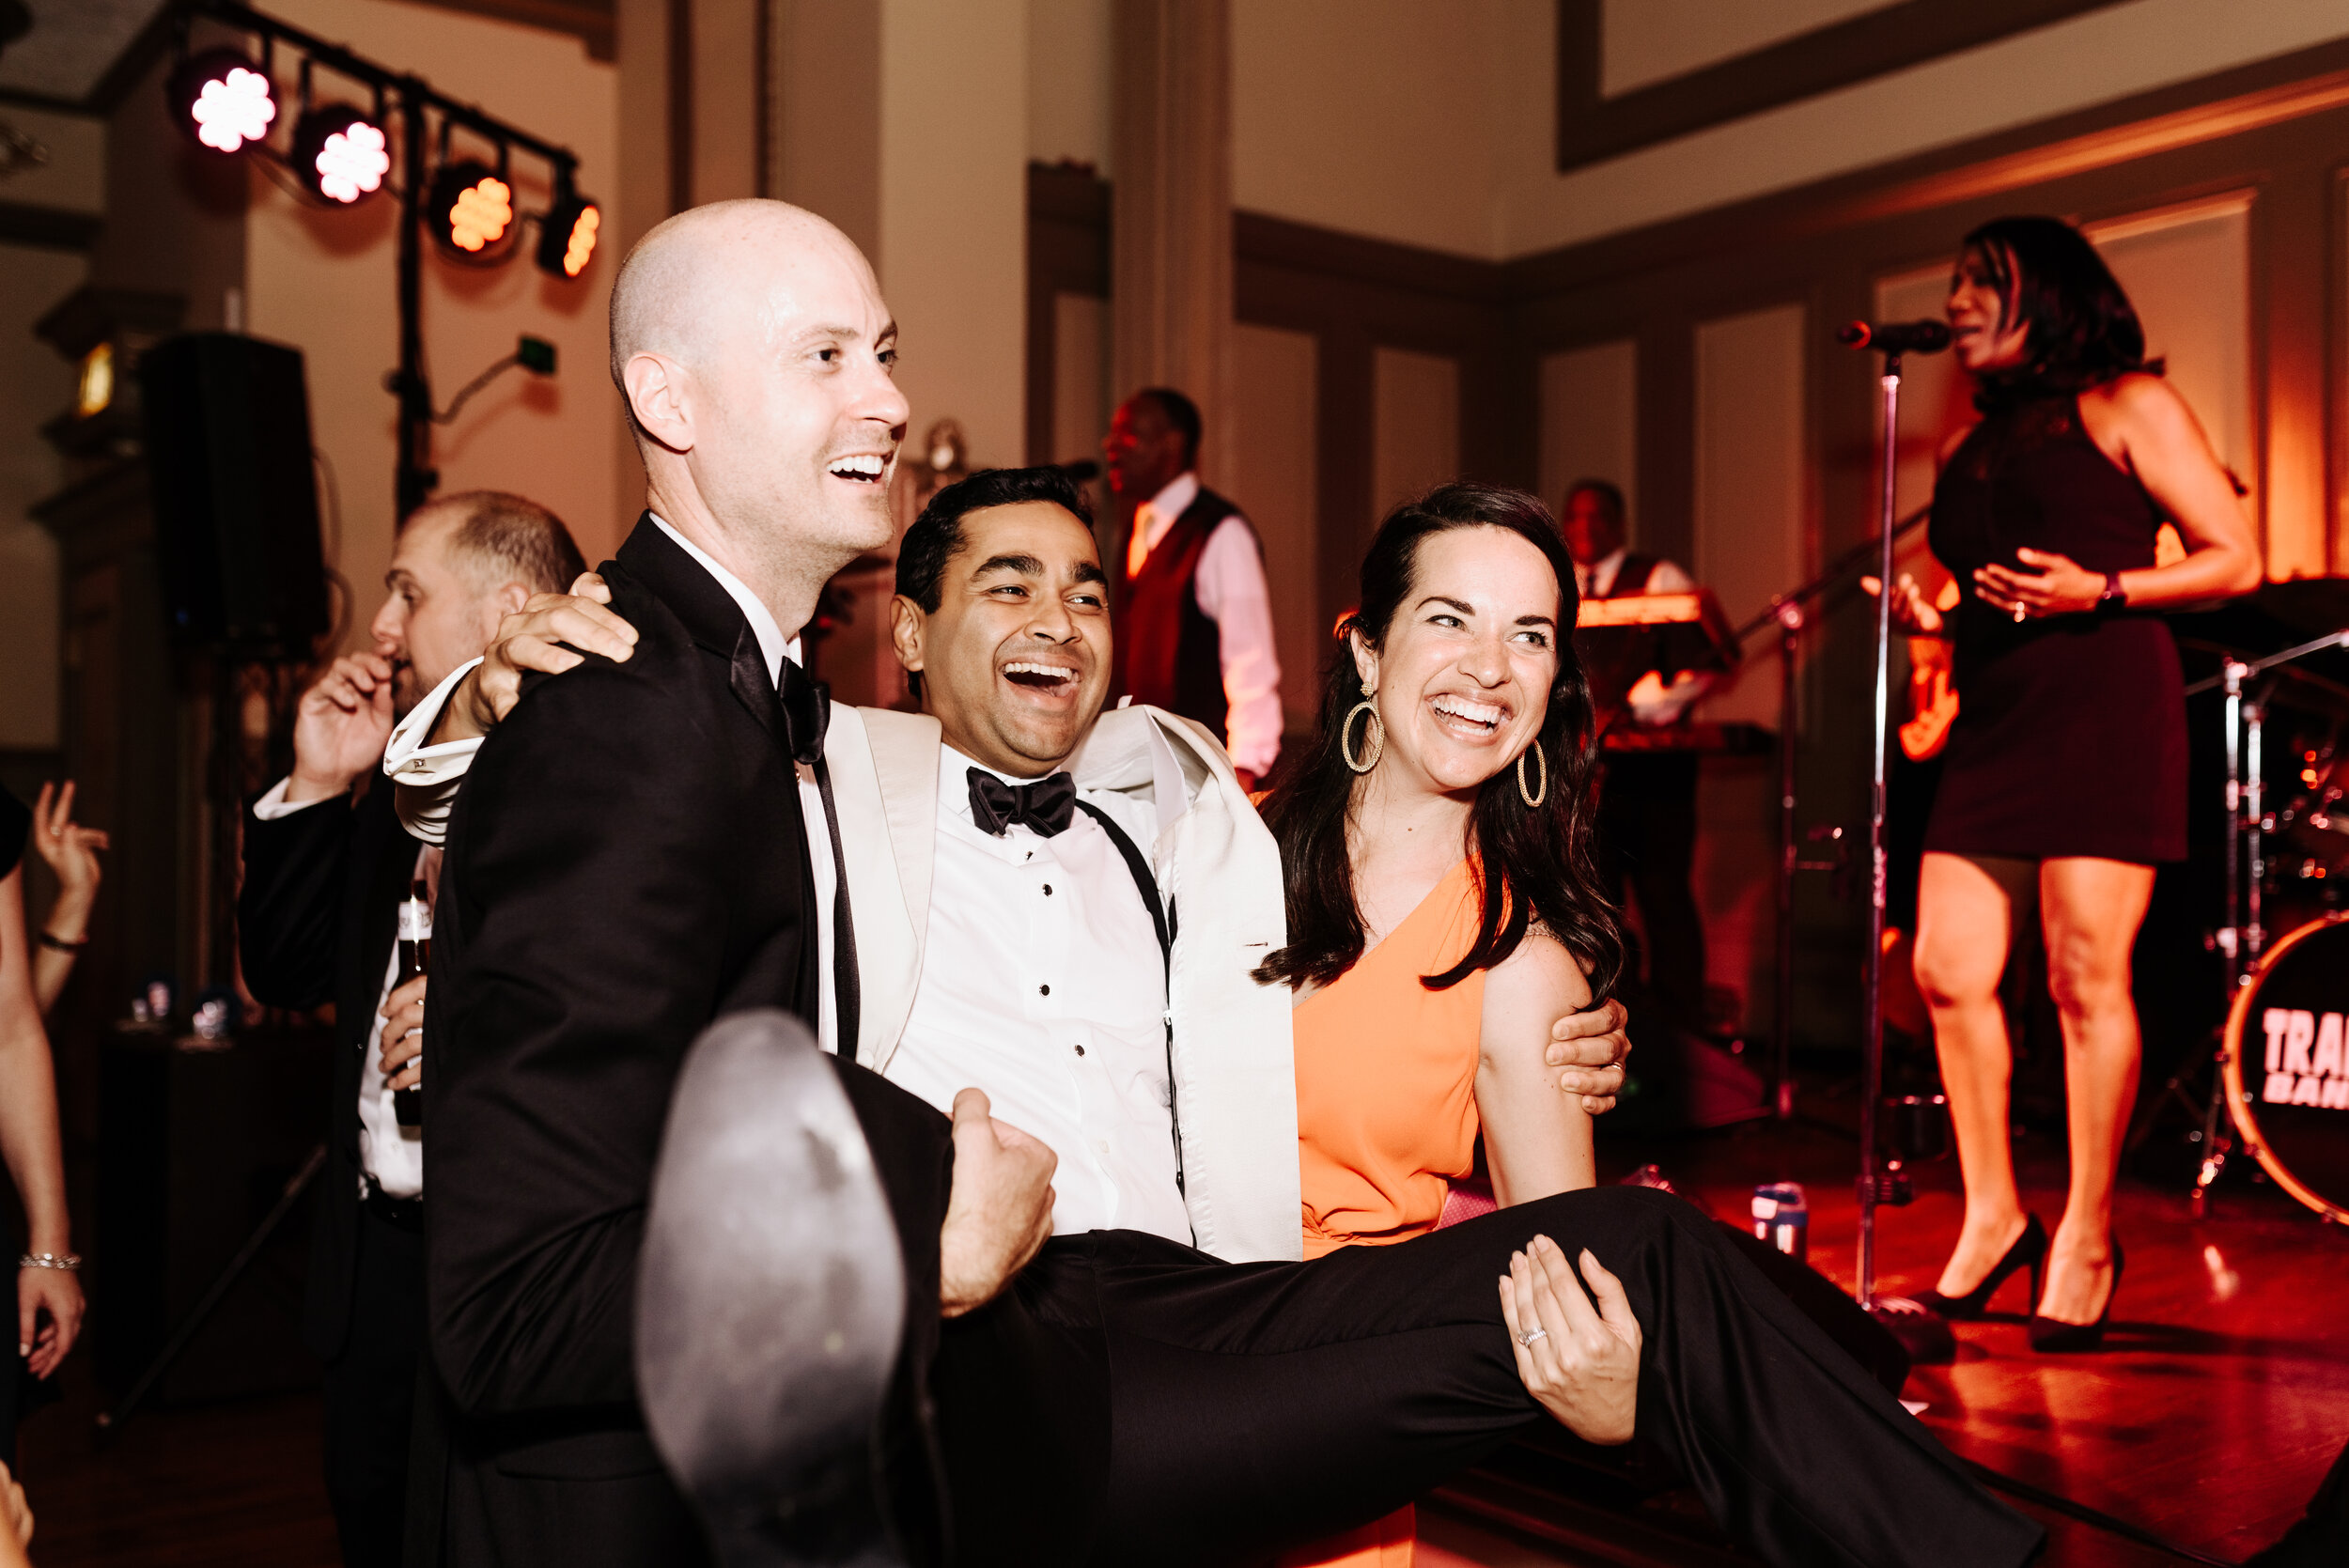 Cassie-Mrunal-Wedding-Quirk-Hotel-John-Marshall-Ballrooms-Richmond-Virginia-Photography-by-V-117.jpg